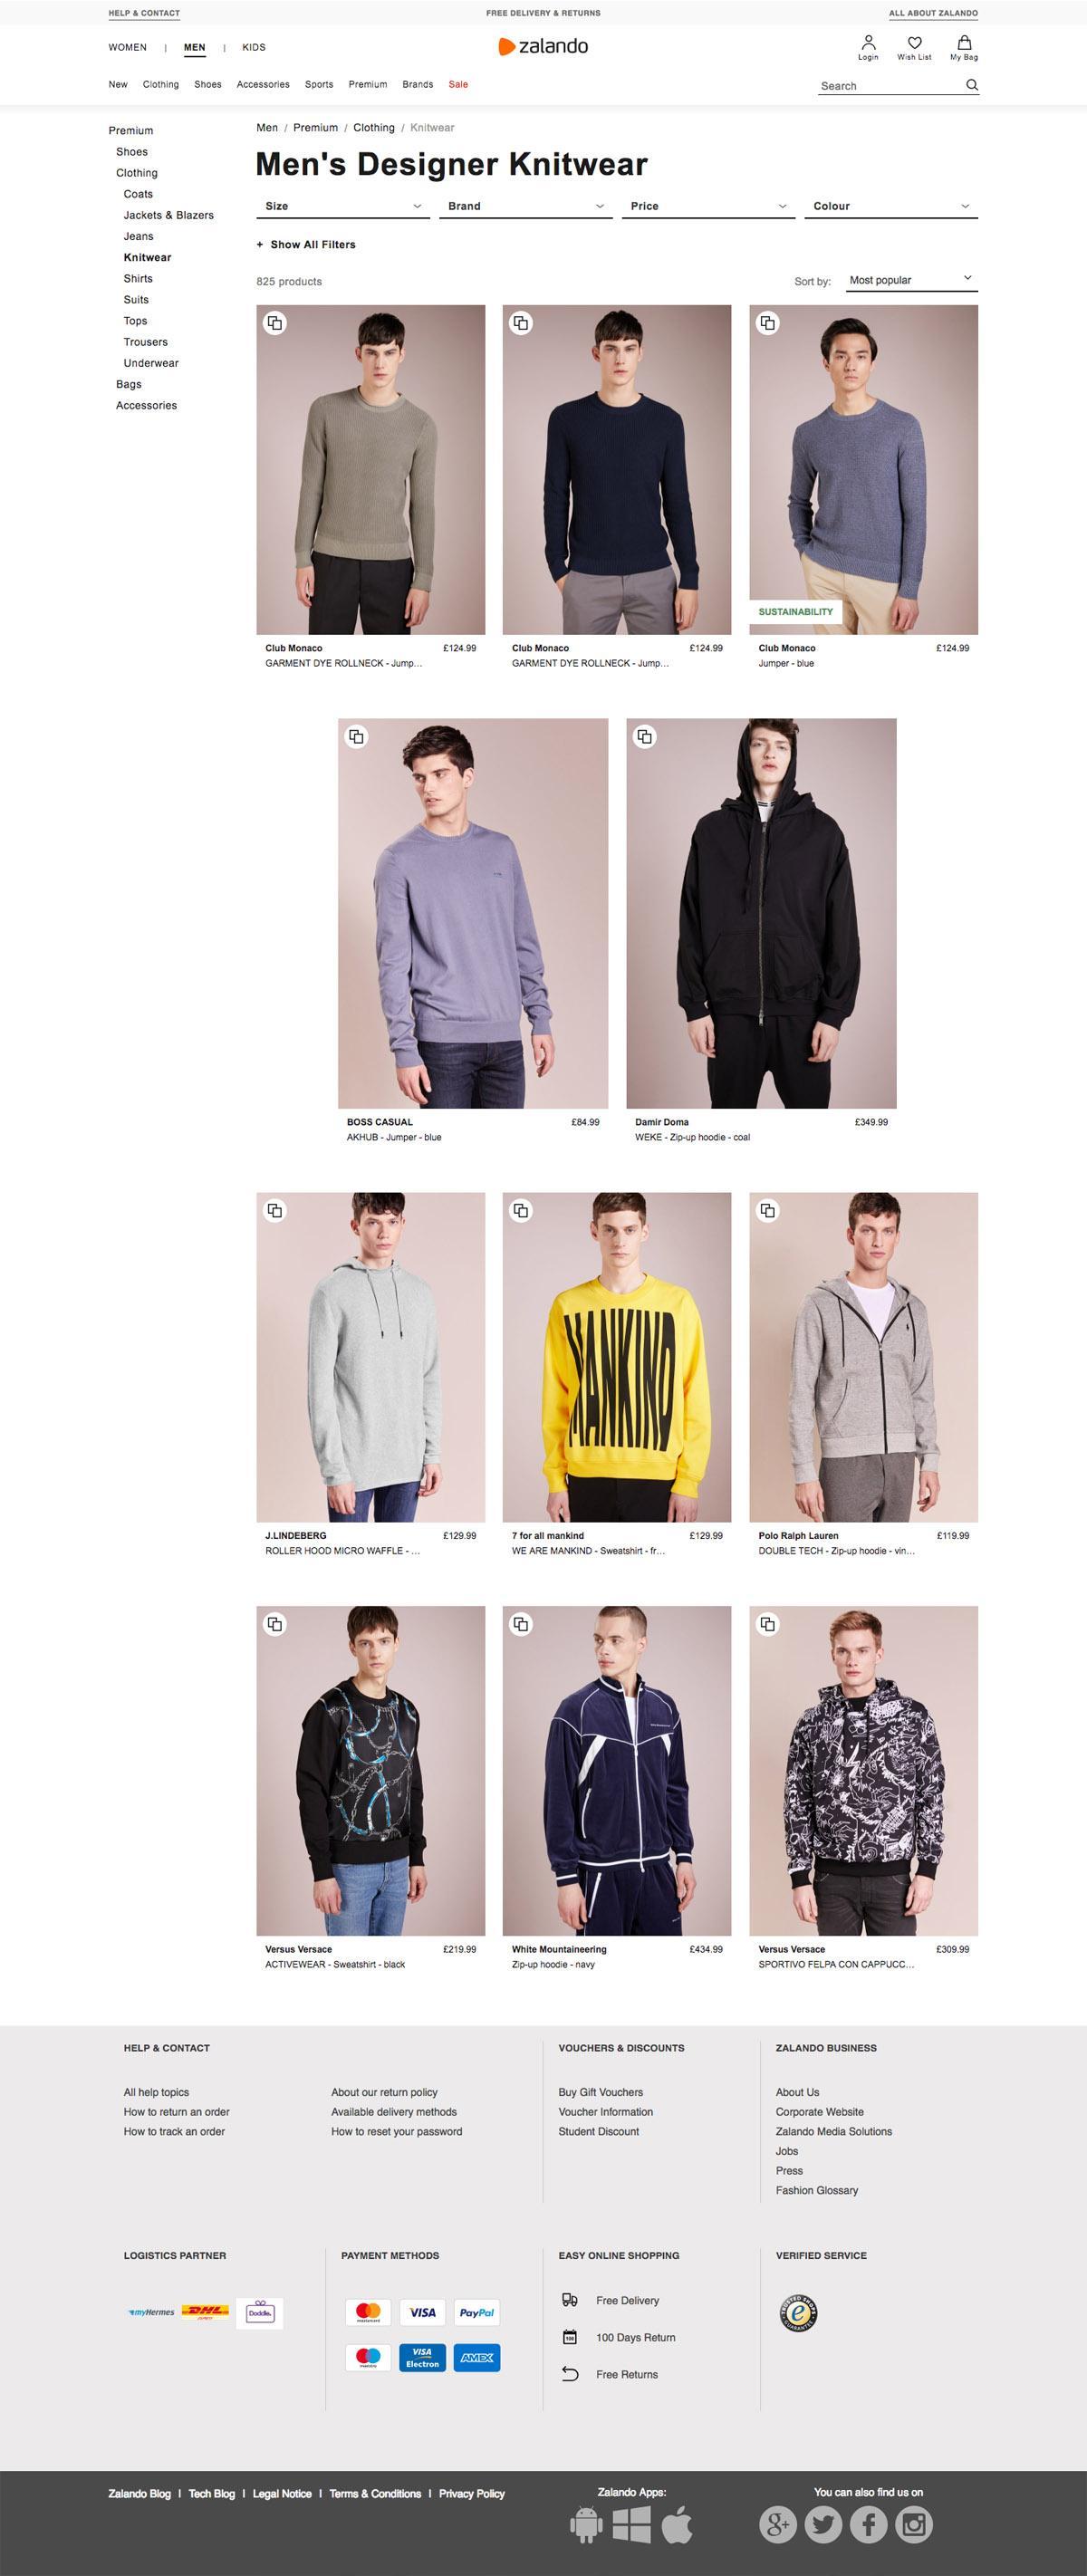 eCommerce website: Zalando